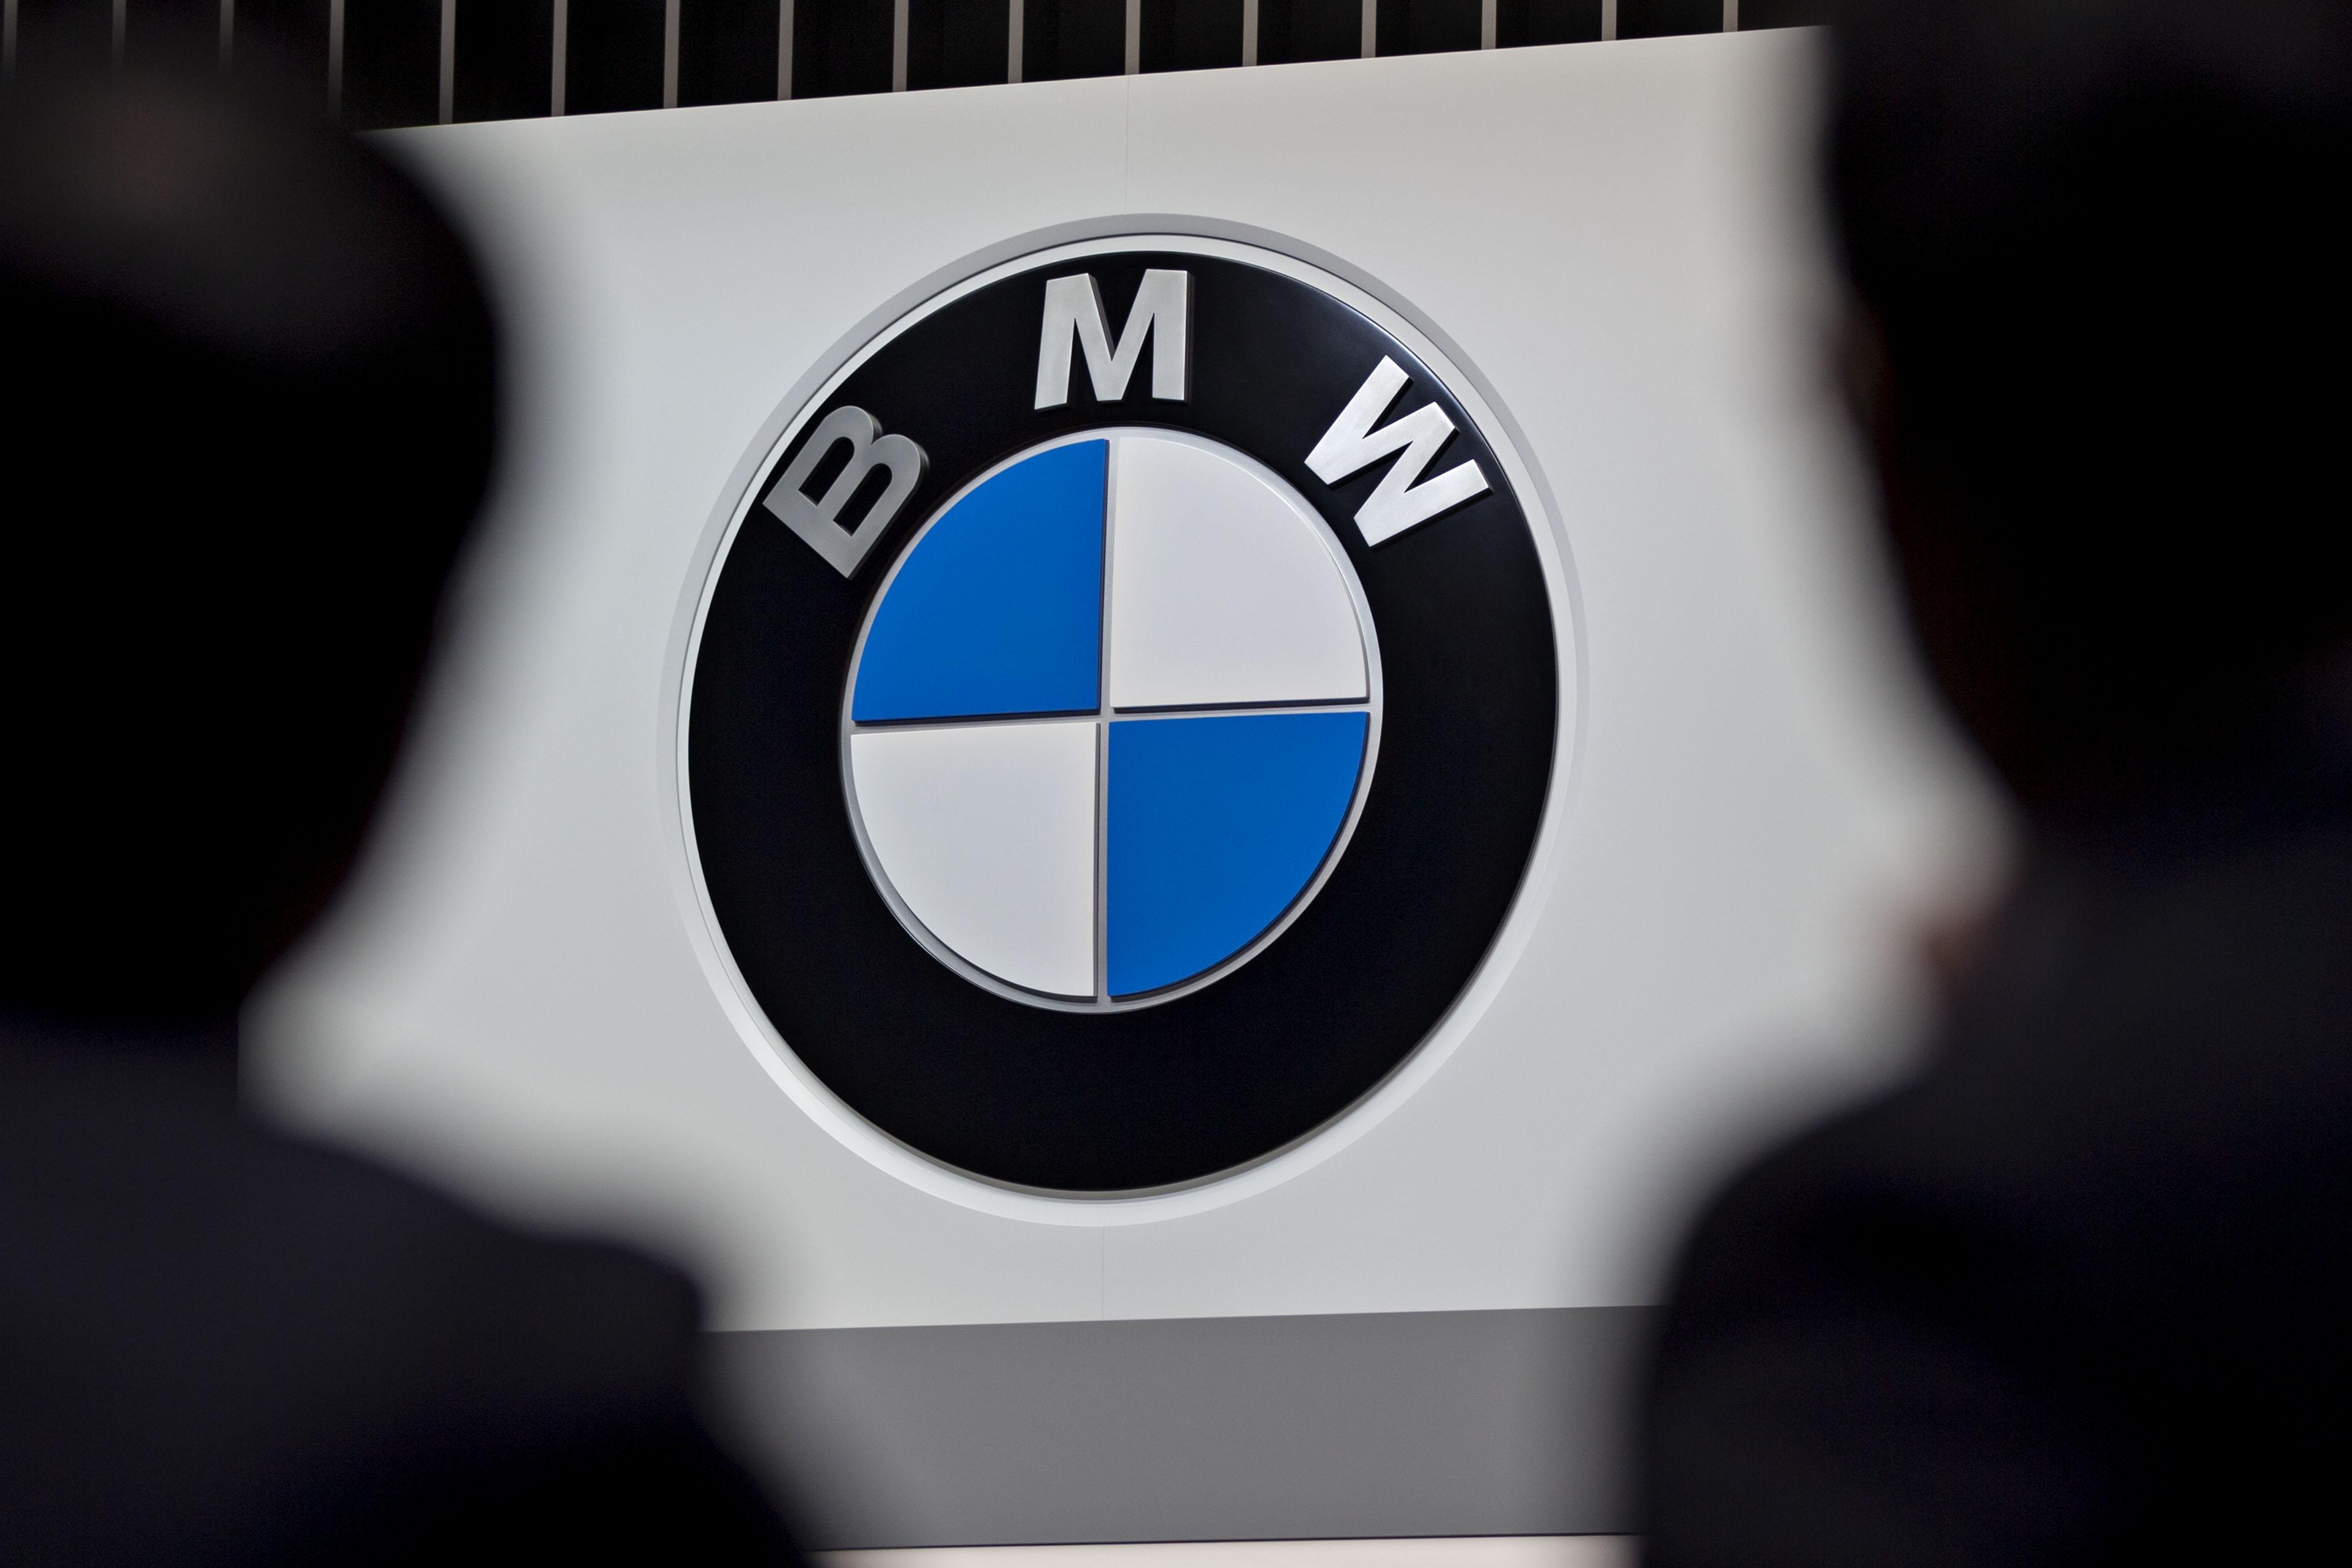 Bmwxetra Stock Quote Bayerische Motoren Werke Ag Bloomberg Markets